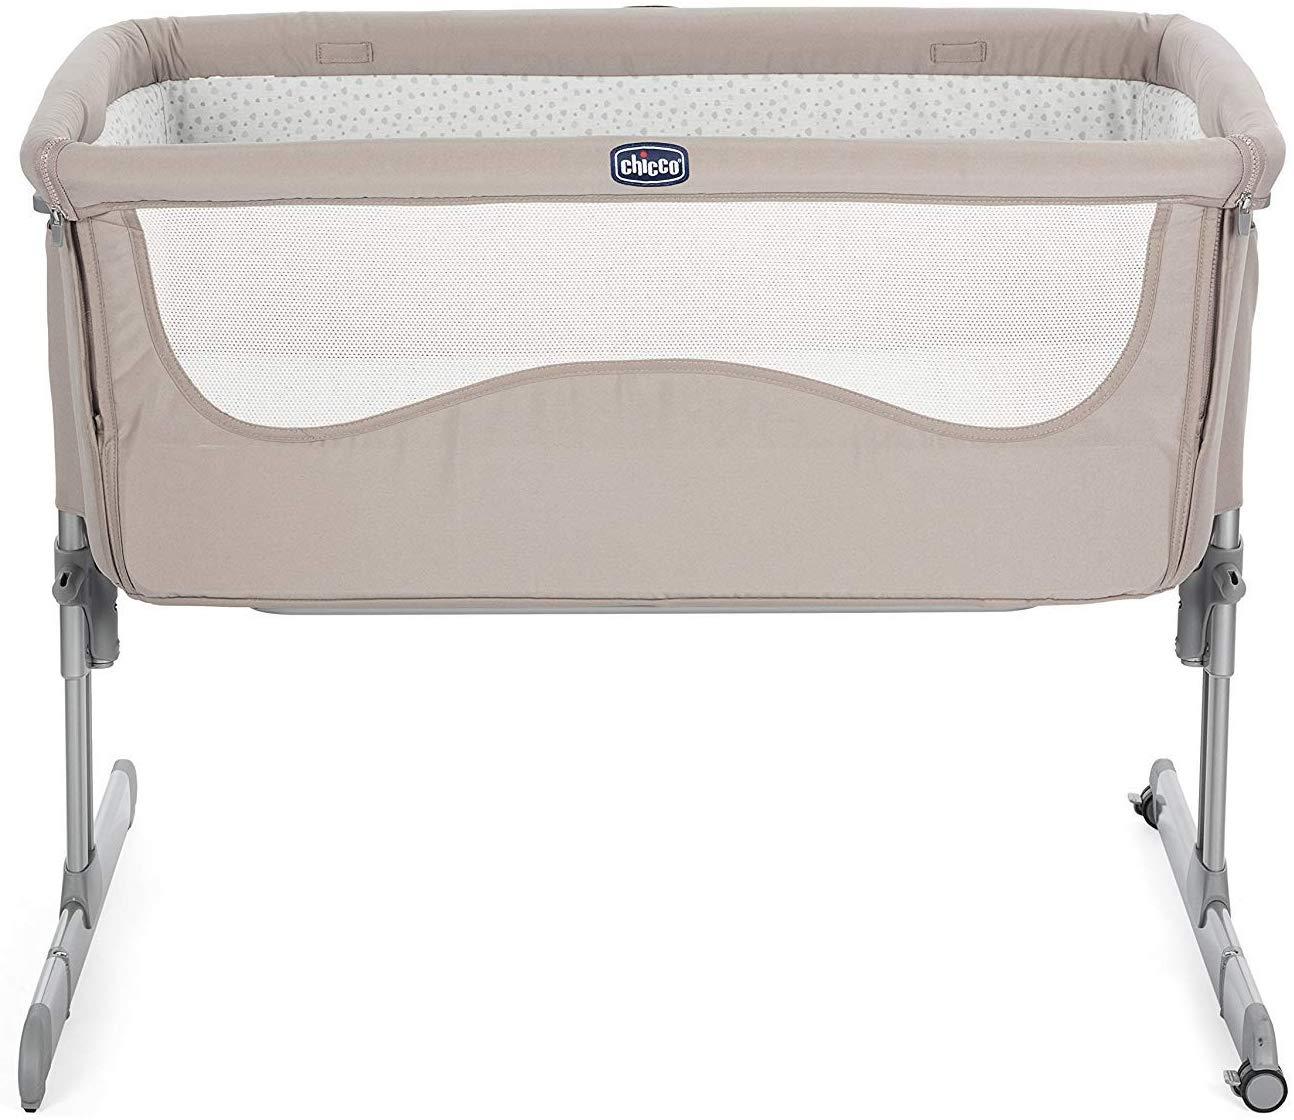 Chicco Next2me Side Sleeping Crib - Chick to Chick - £129 @ Amazon